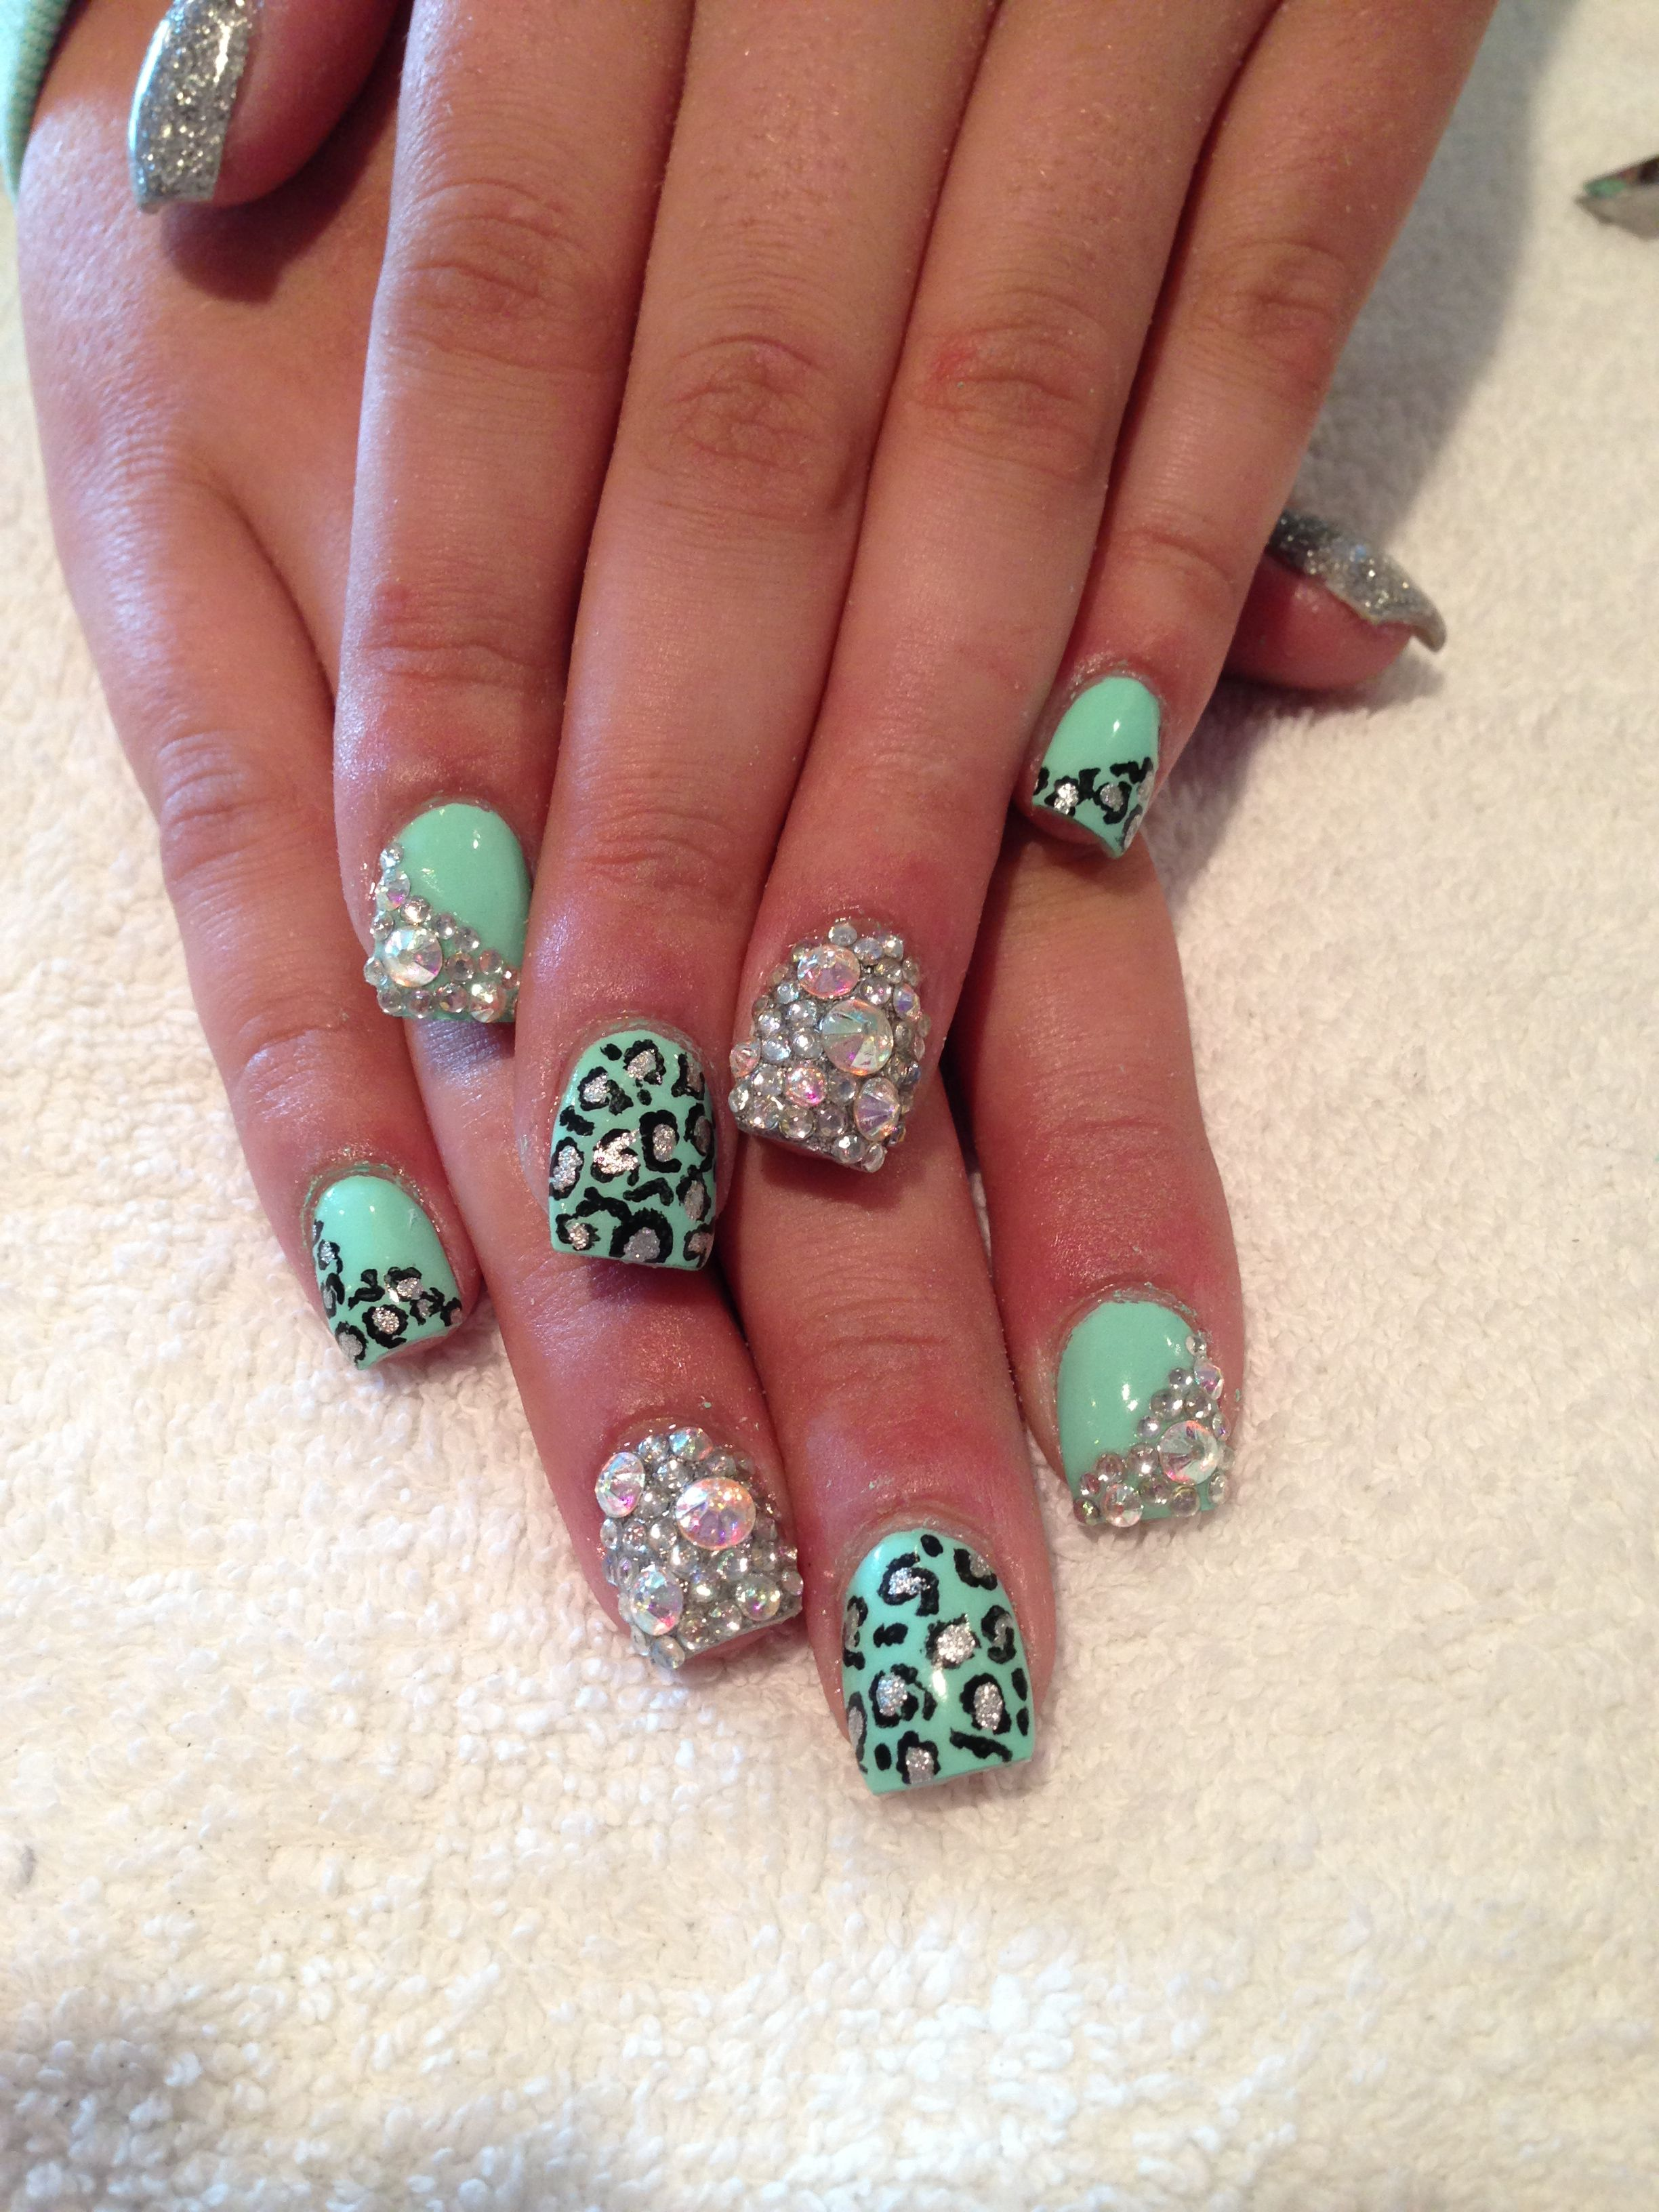 Body & Sole Estevan, Sk Www.bodysole.ca Acrylic nails | Fake nails ...